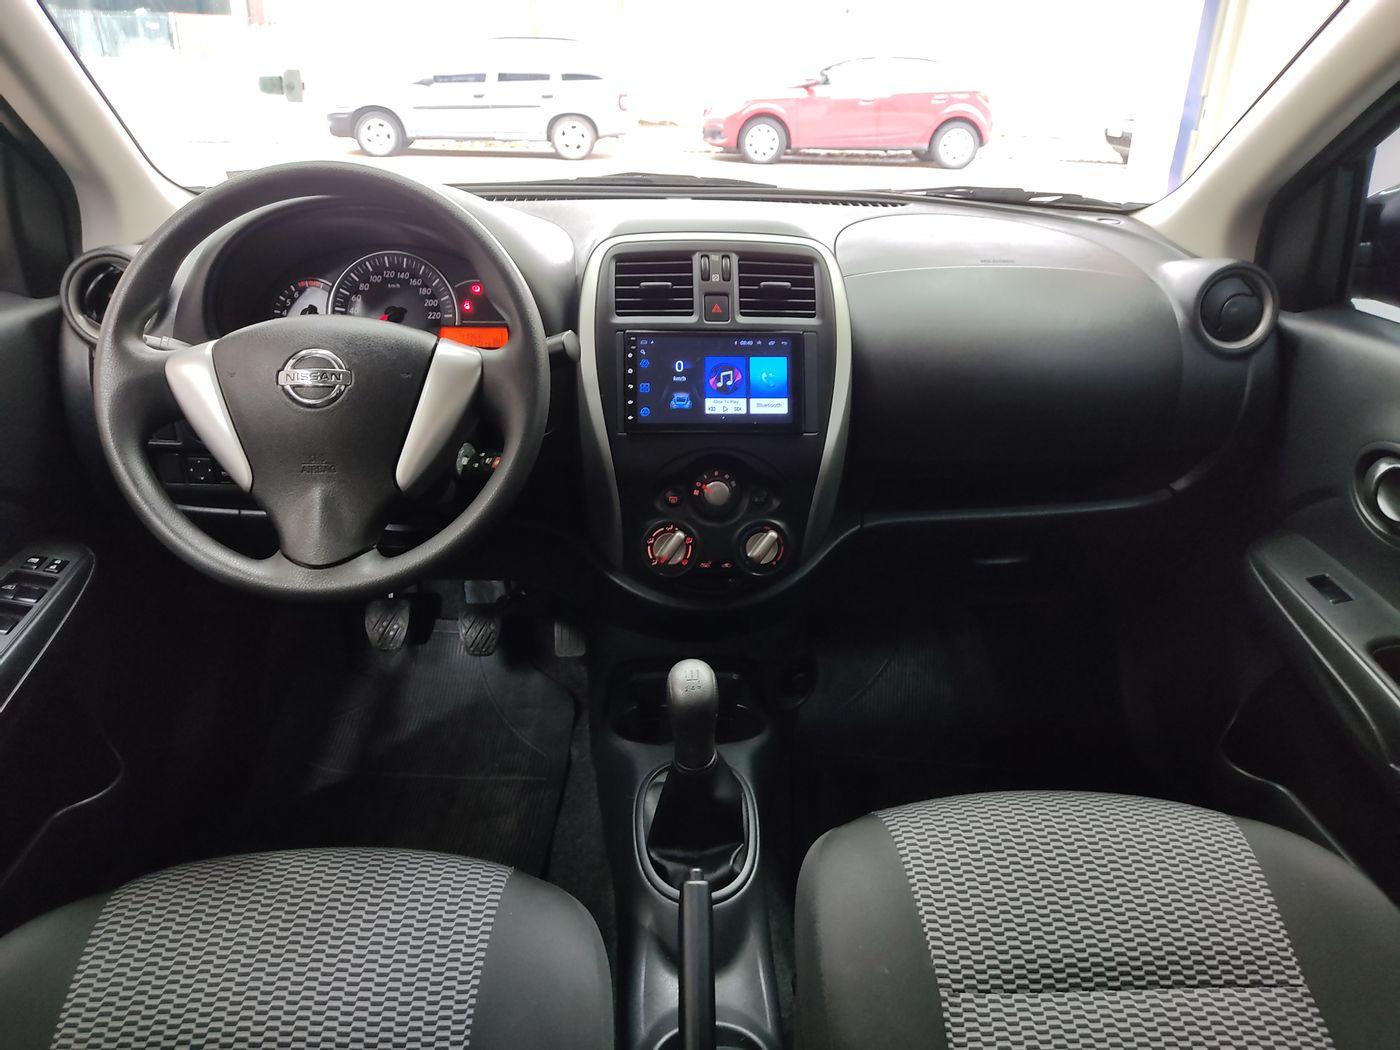 Nissan VERSA 1.0 12V FlexStart 4p Mec.